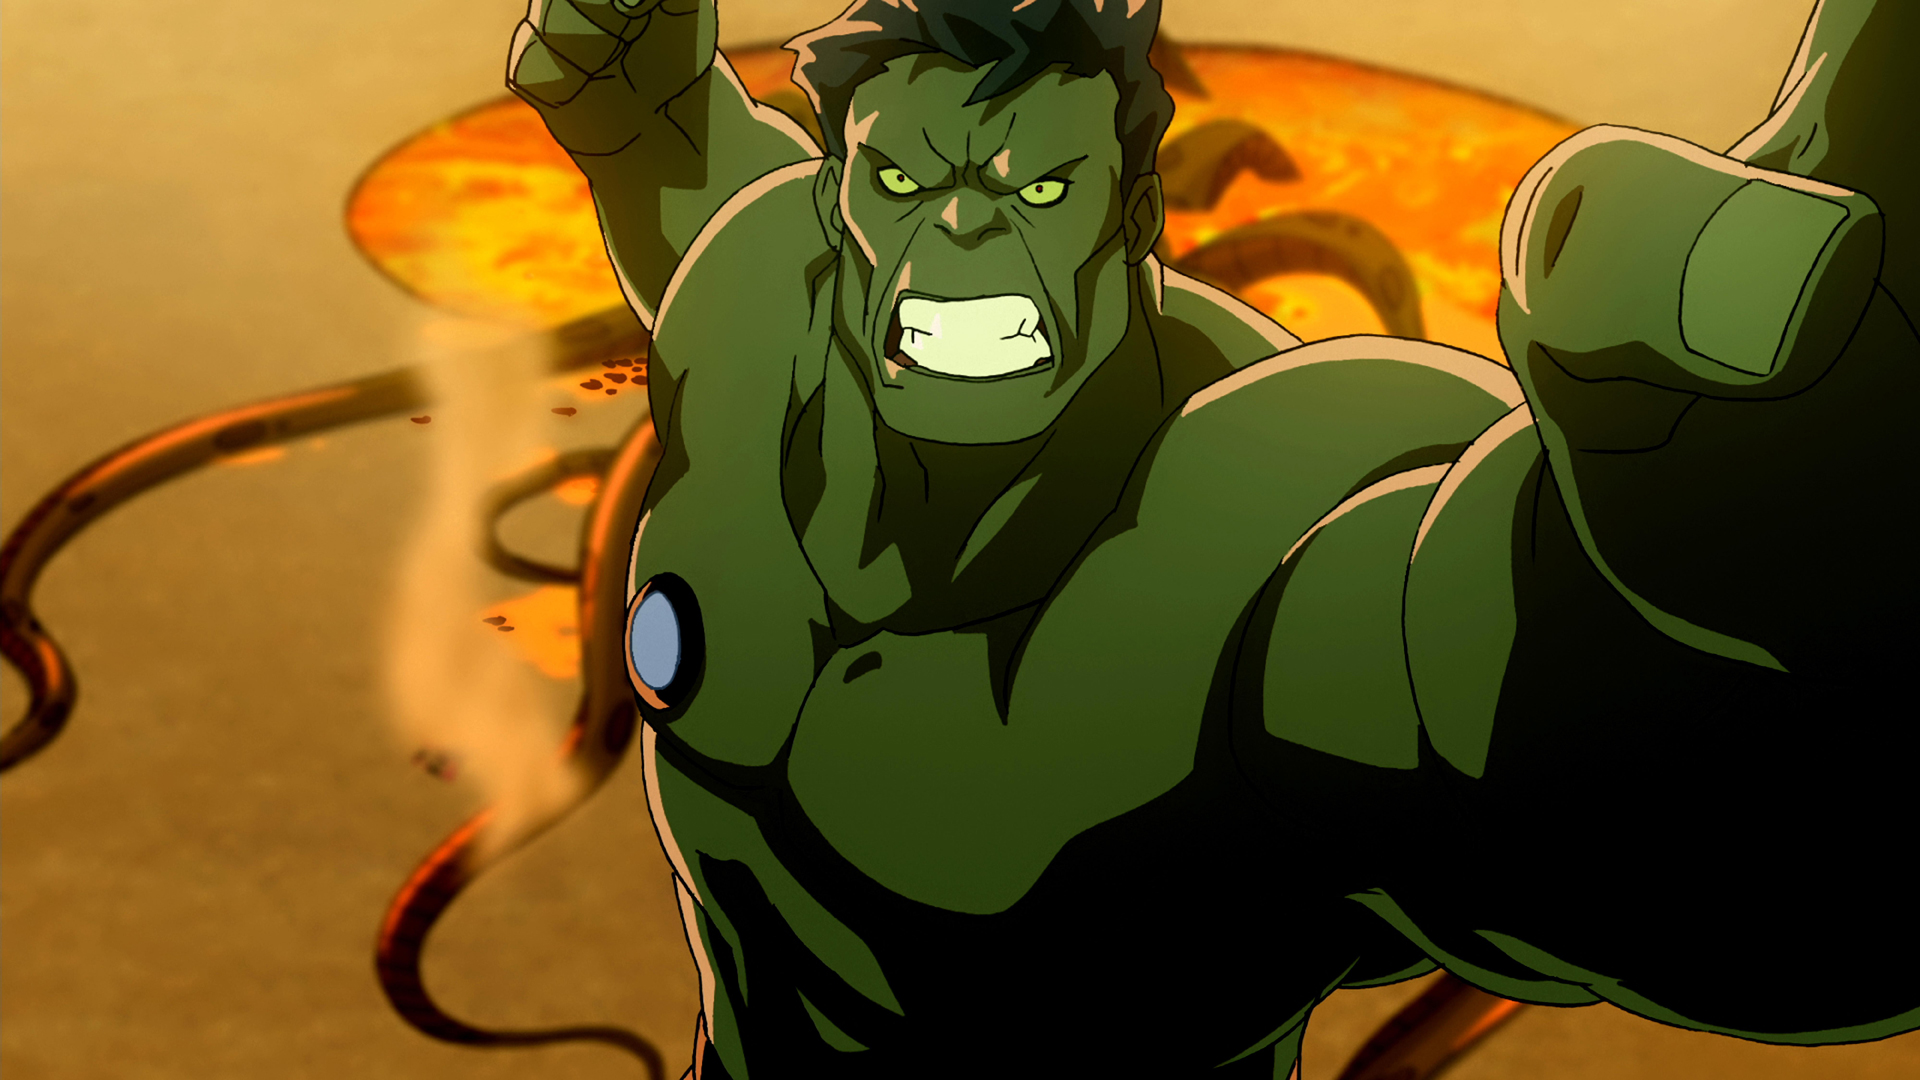 planet hulk movie - HD1920×1080